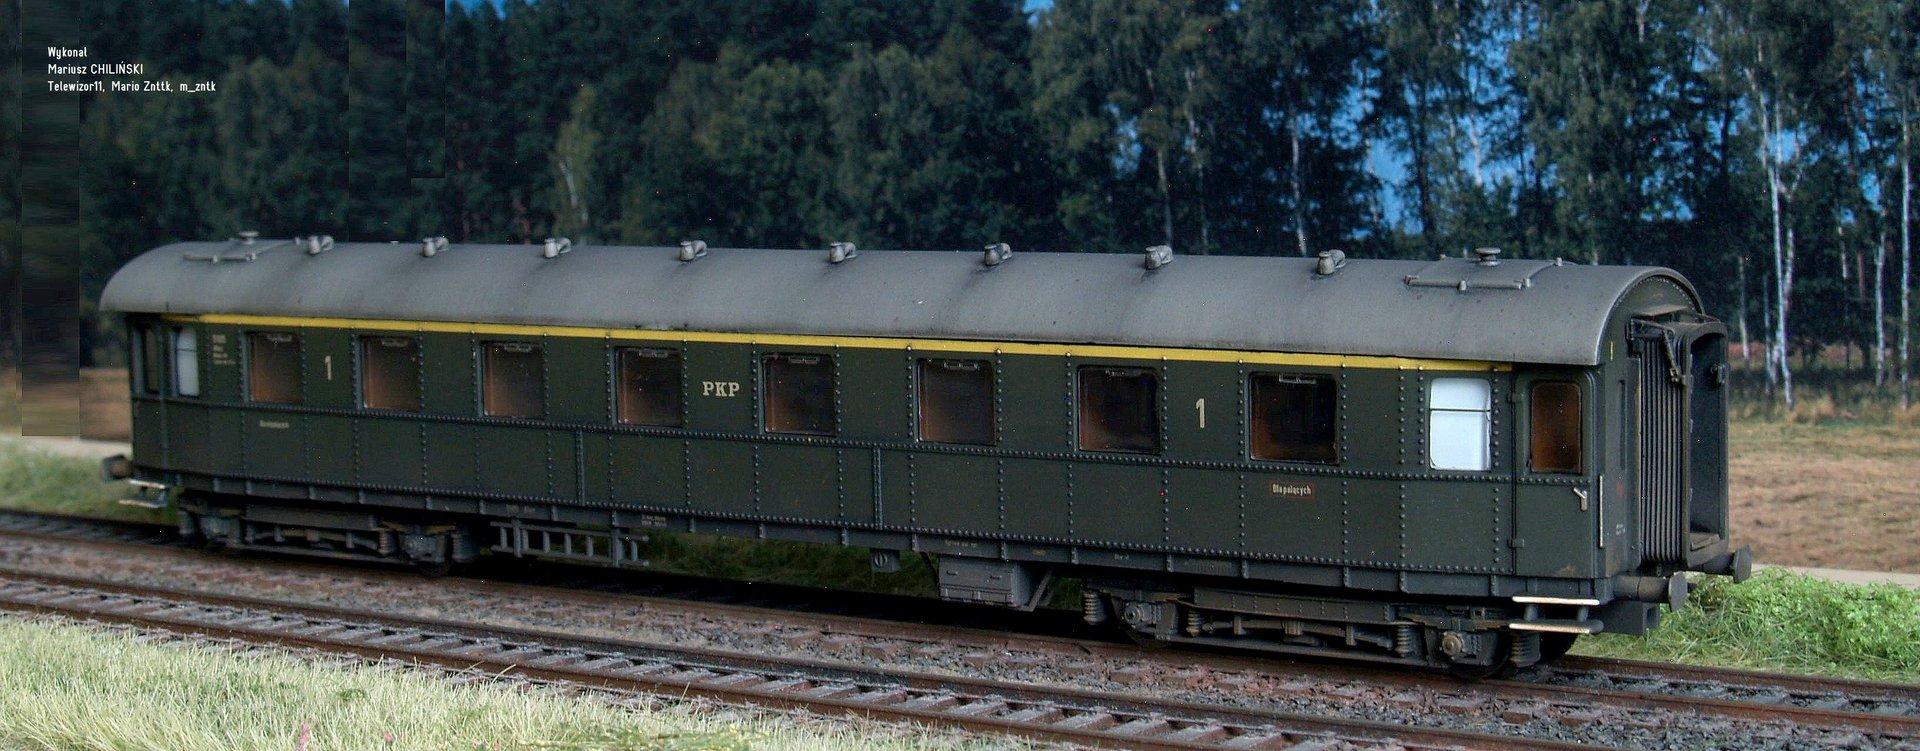 P1012486.JPG